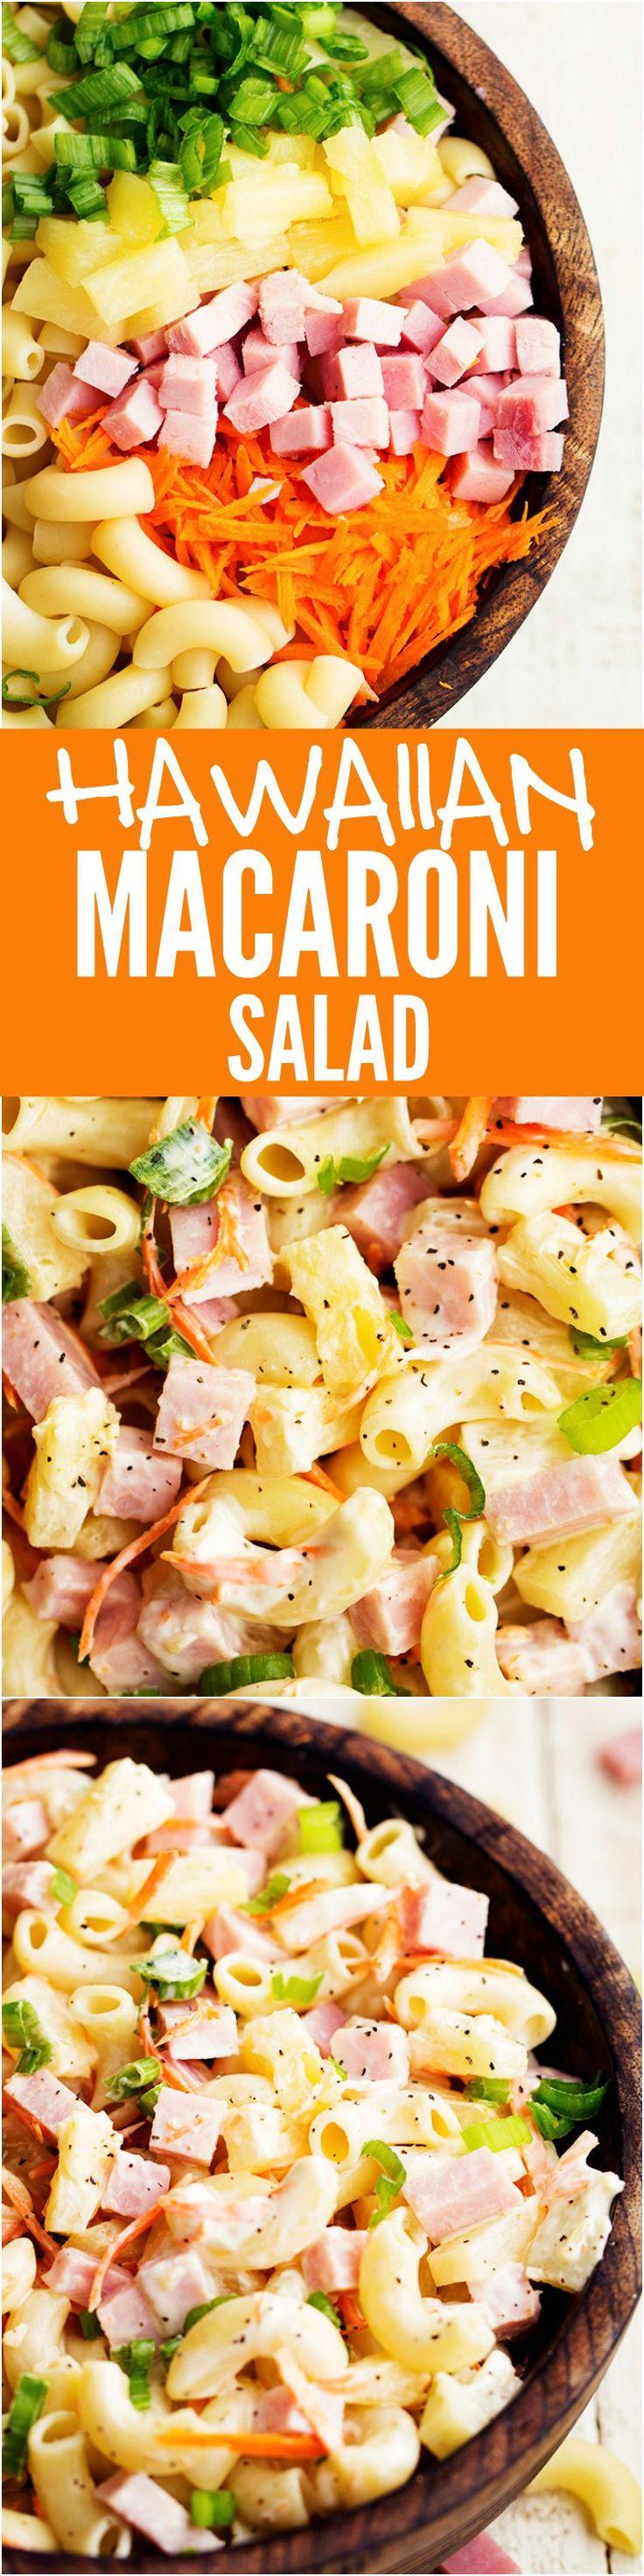 programme du r gime salade de macaroni hawa en virtual fitness votre magazine d. Black Bedroom Furniture Sets. Home Design Ideas